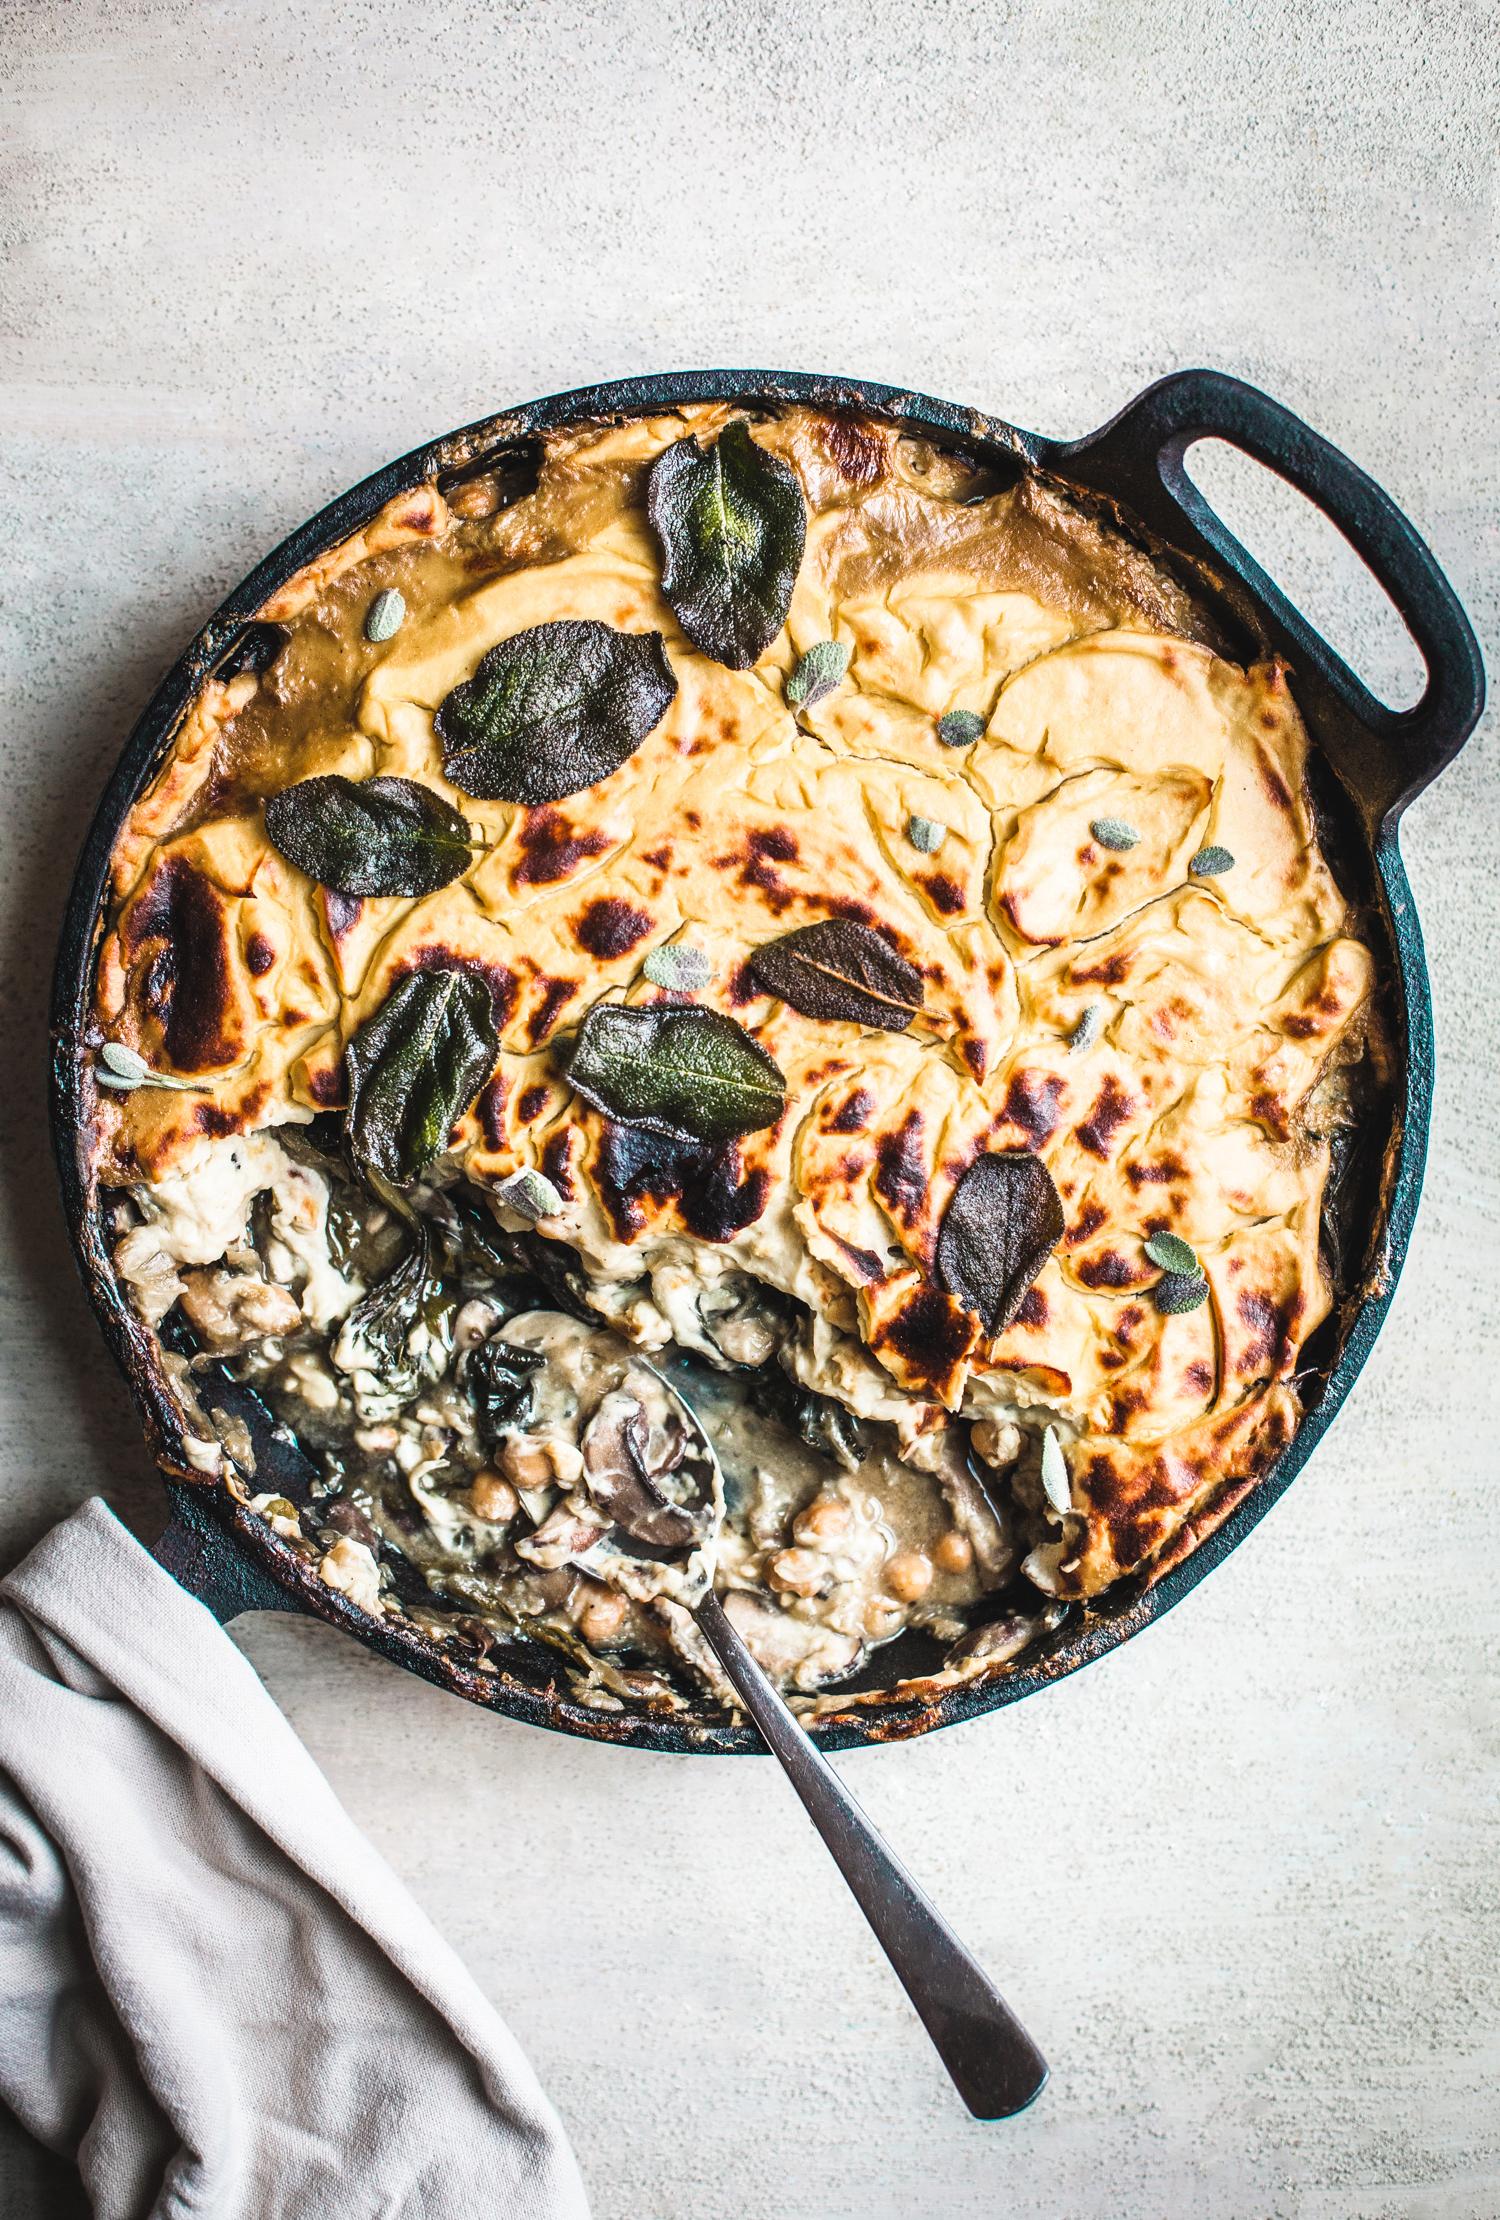 Amy Chaplin's Mushroom and Onion Cauliflower Bake - Golubka Kitchen